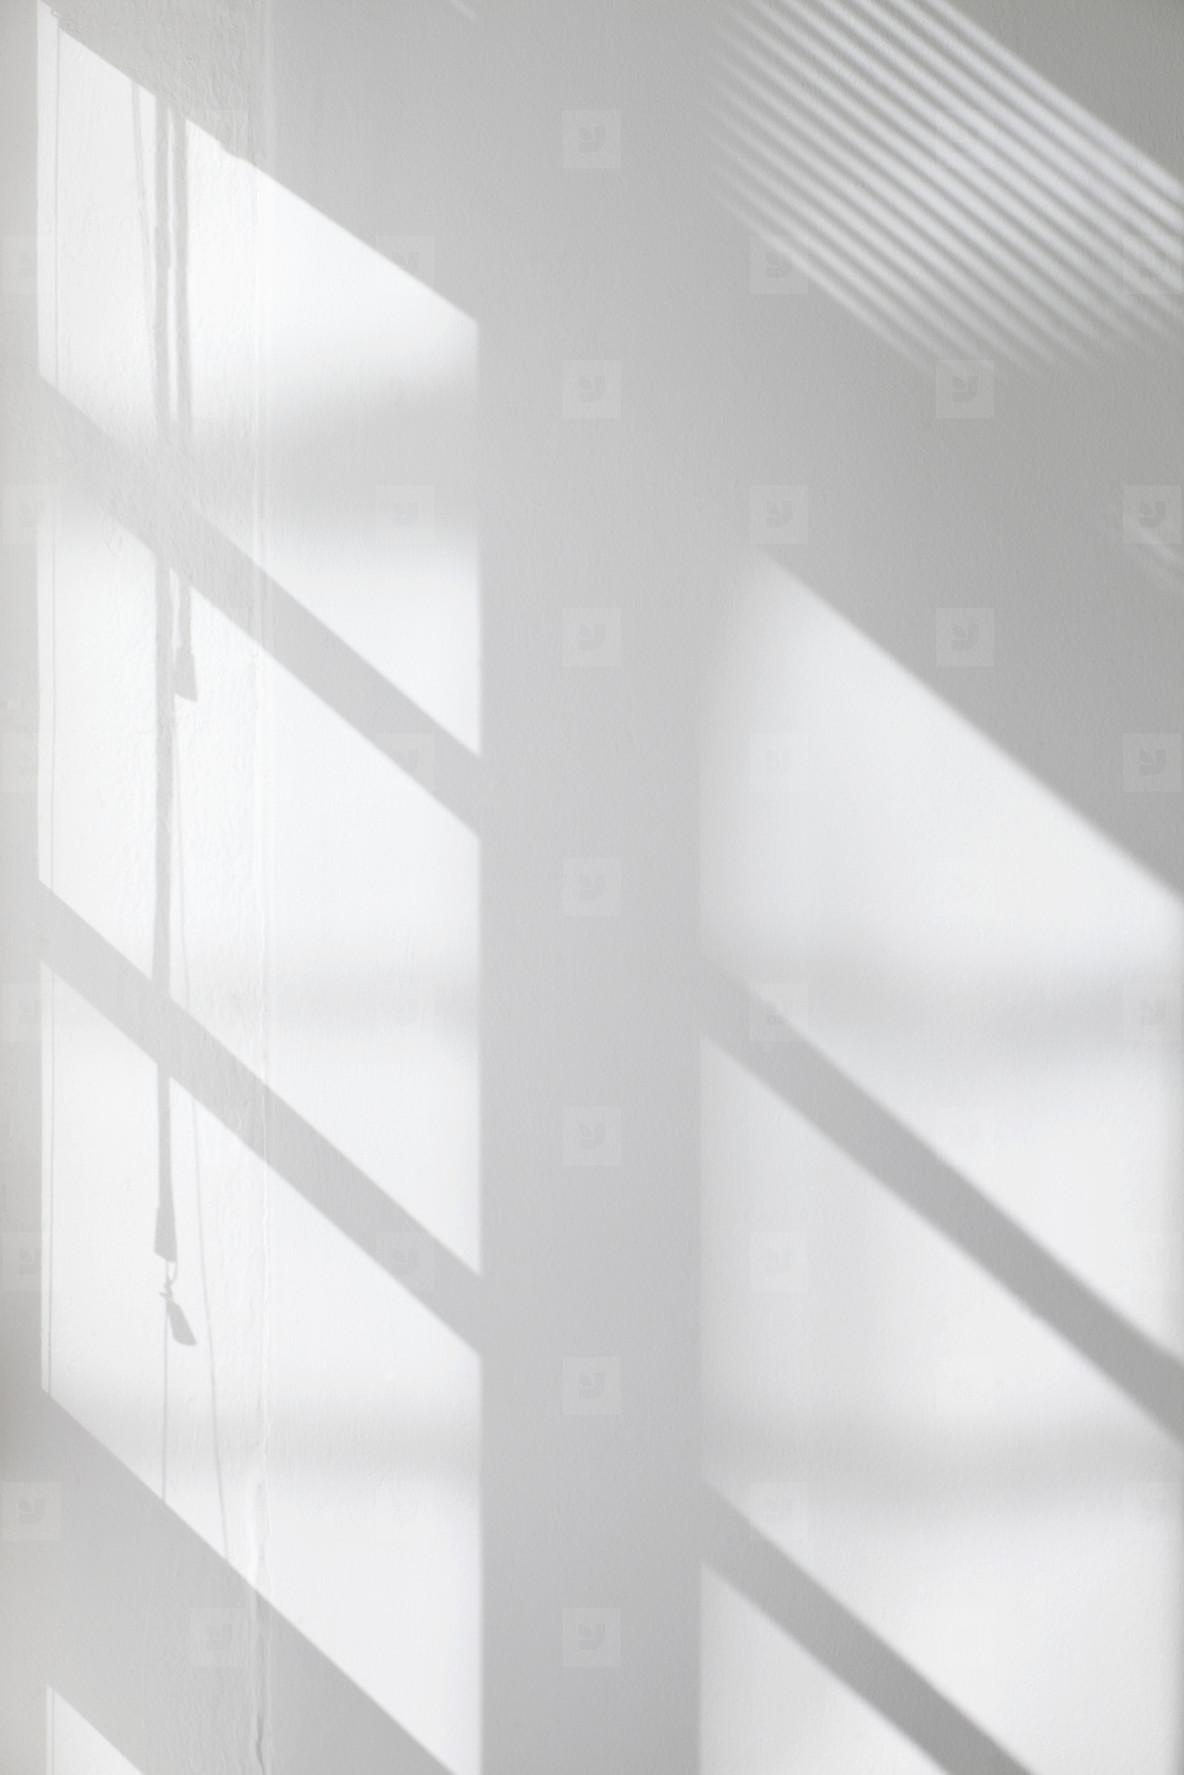 Walls and Windows  06